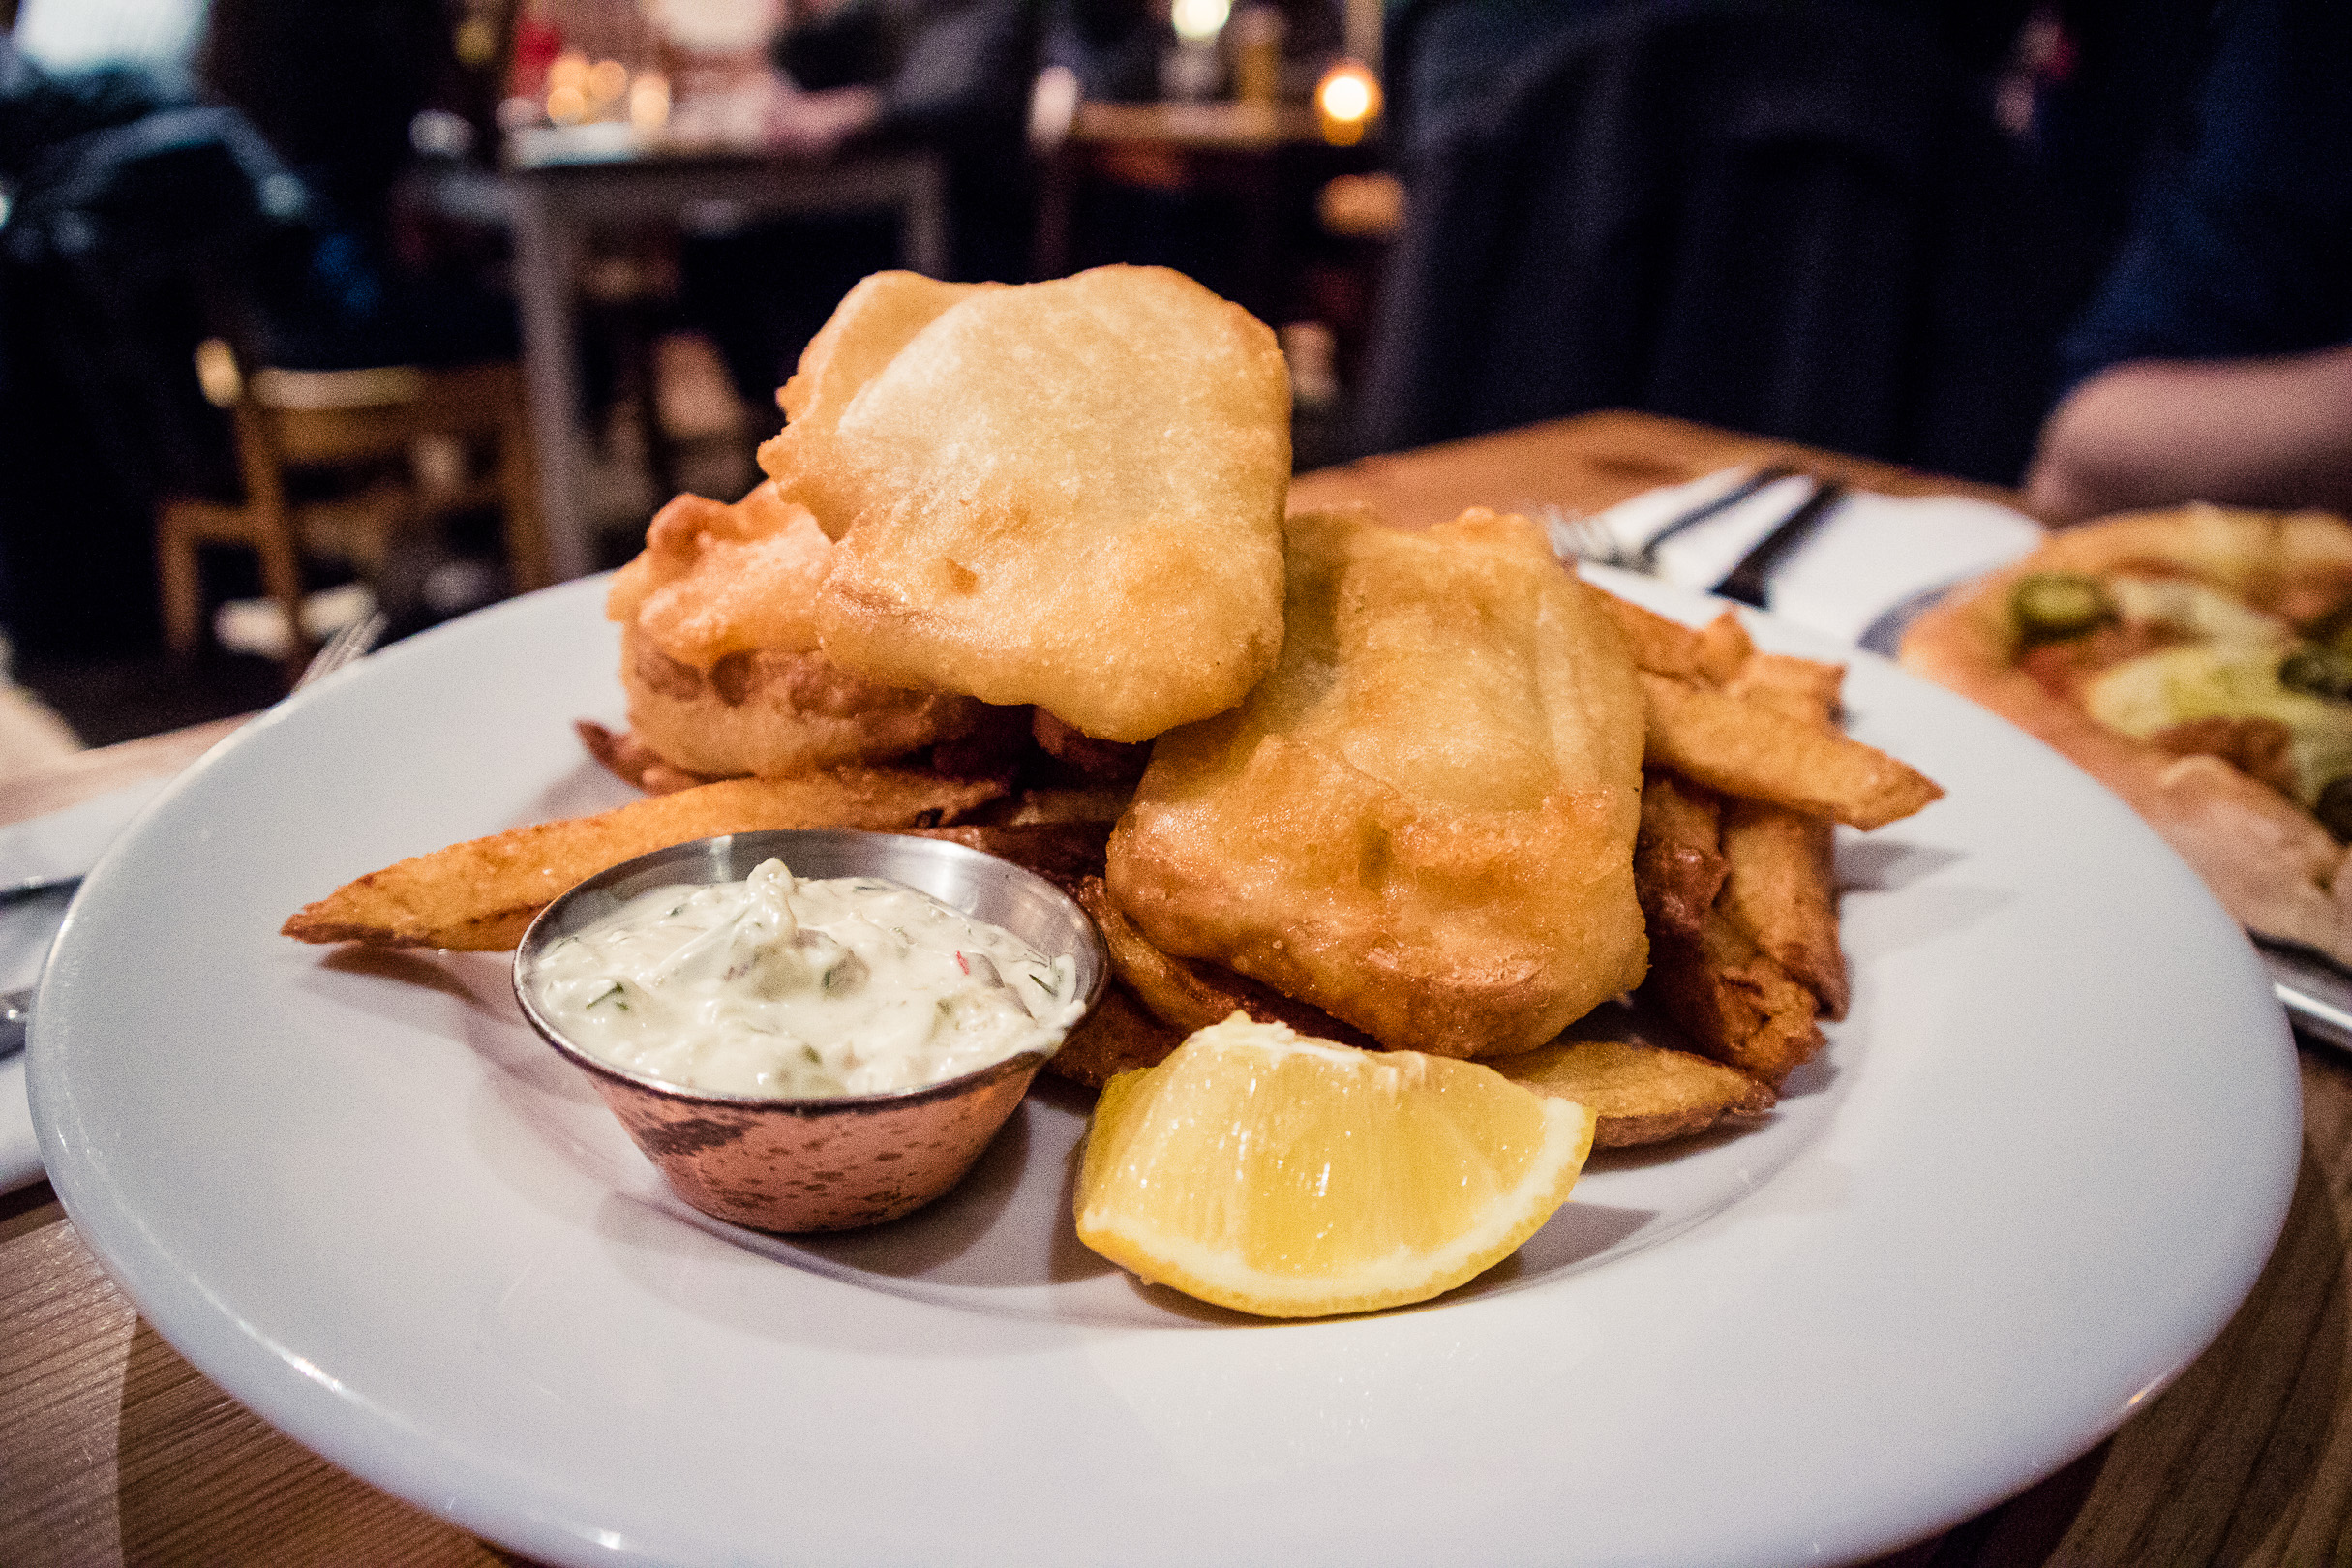 Vegan tofu fish & chips at Mono in Glasgow.